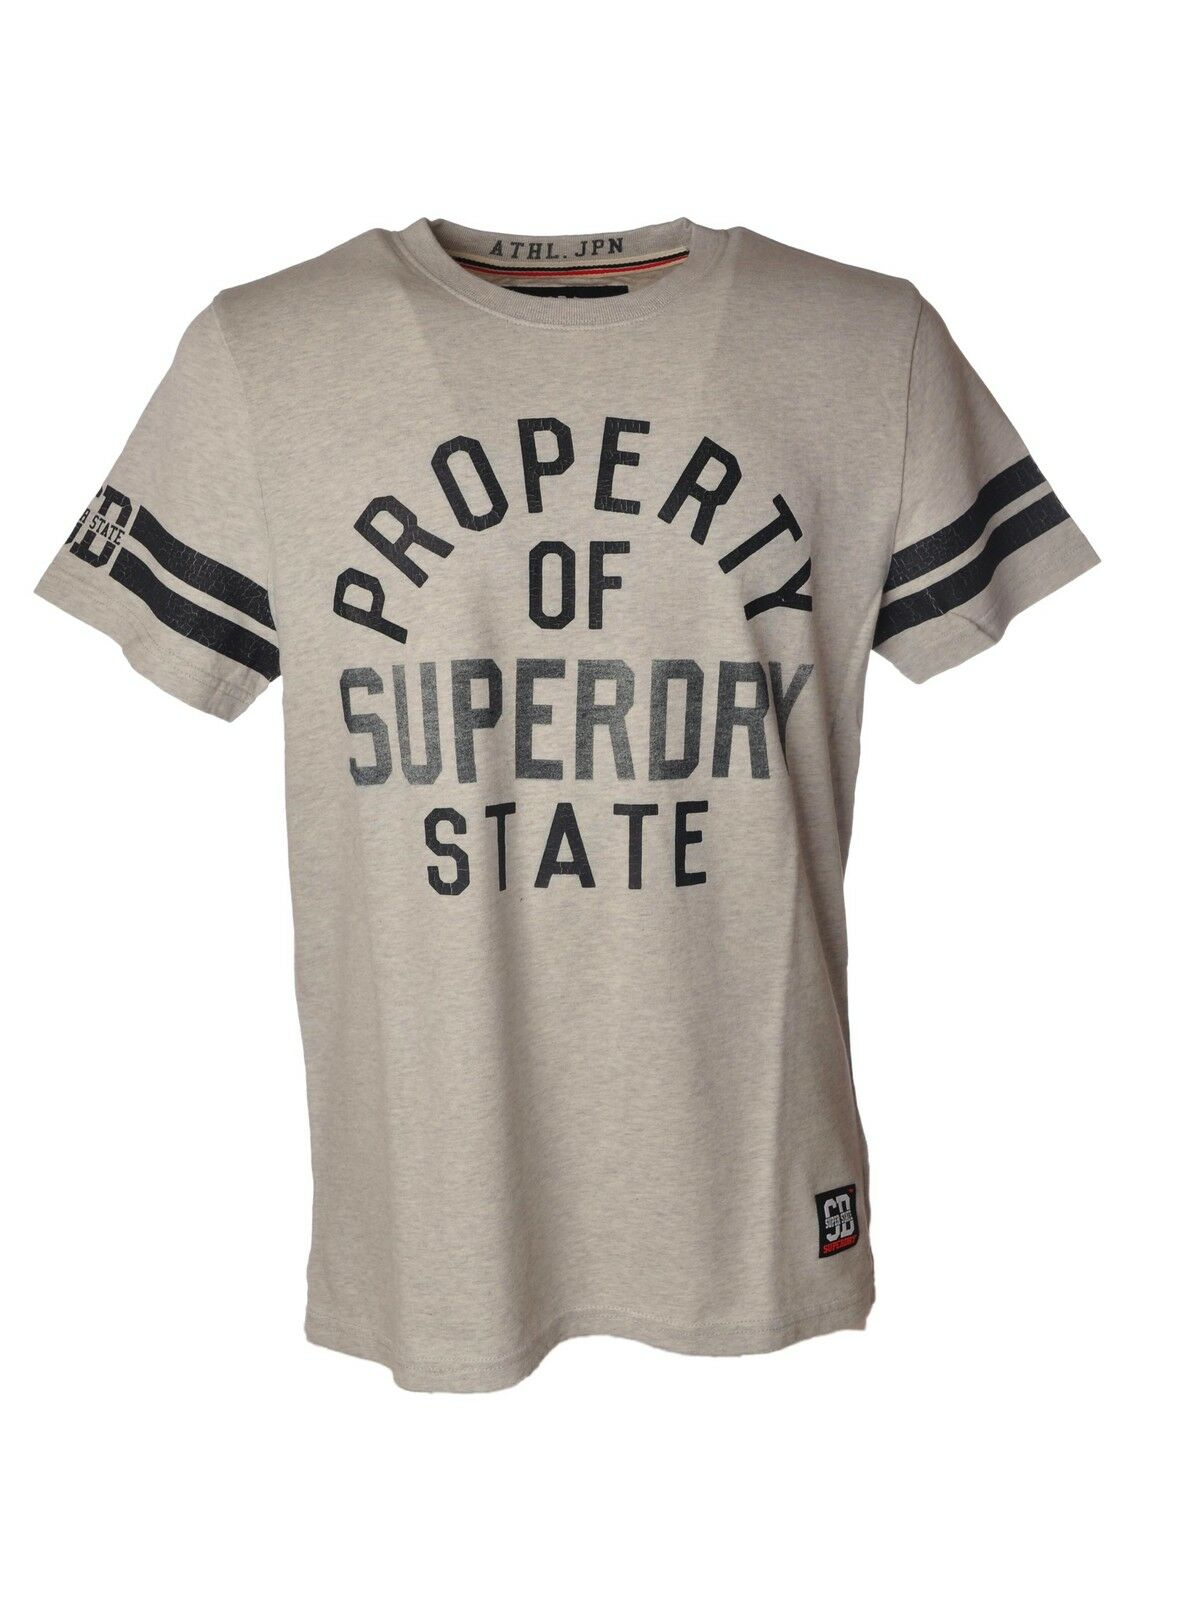 Superdry - Topwear-T-shirts - Mann - Grau - 3830403N184246